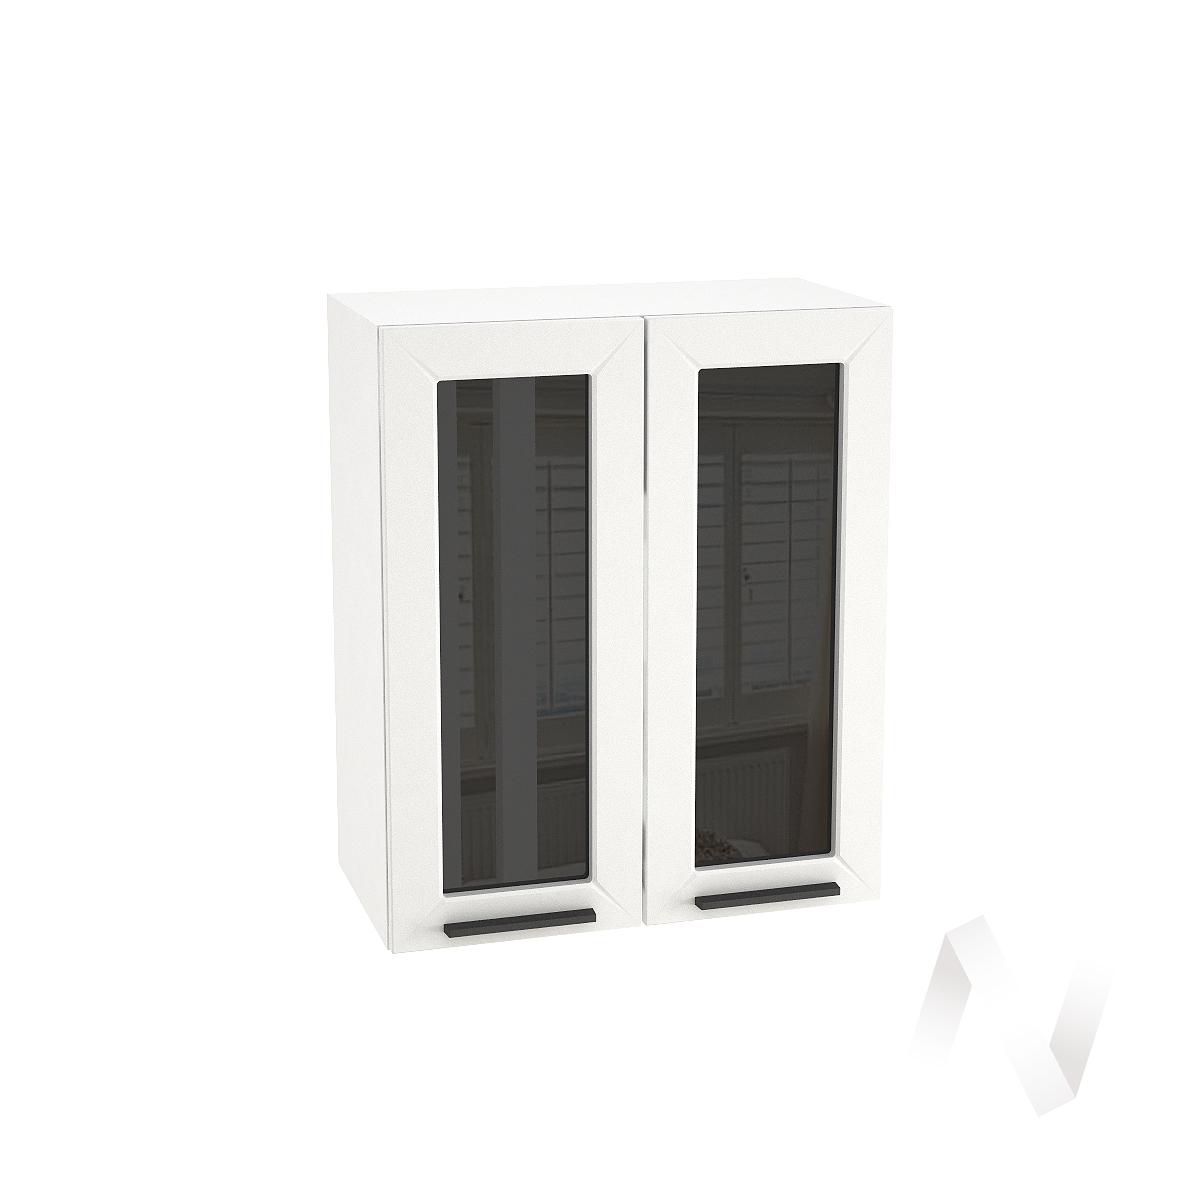 "Кухня ""Глетчер"": Шкаф верхний со стеклом 600, ШВС 600 (Айленд Силк/корпус белый)"